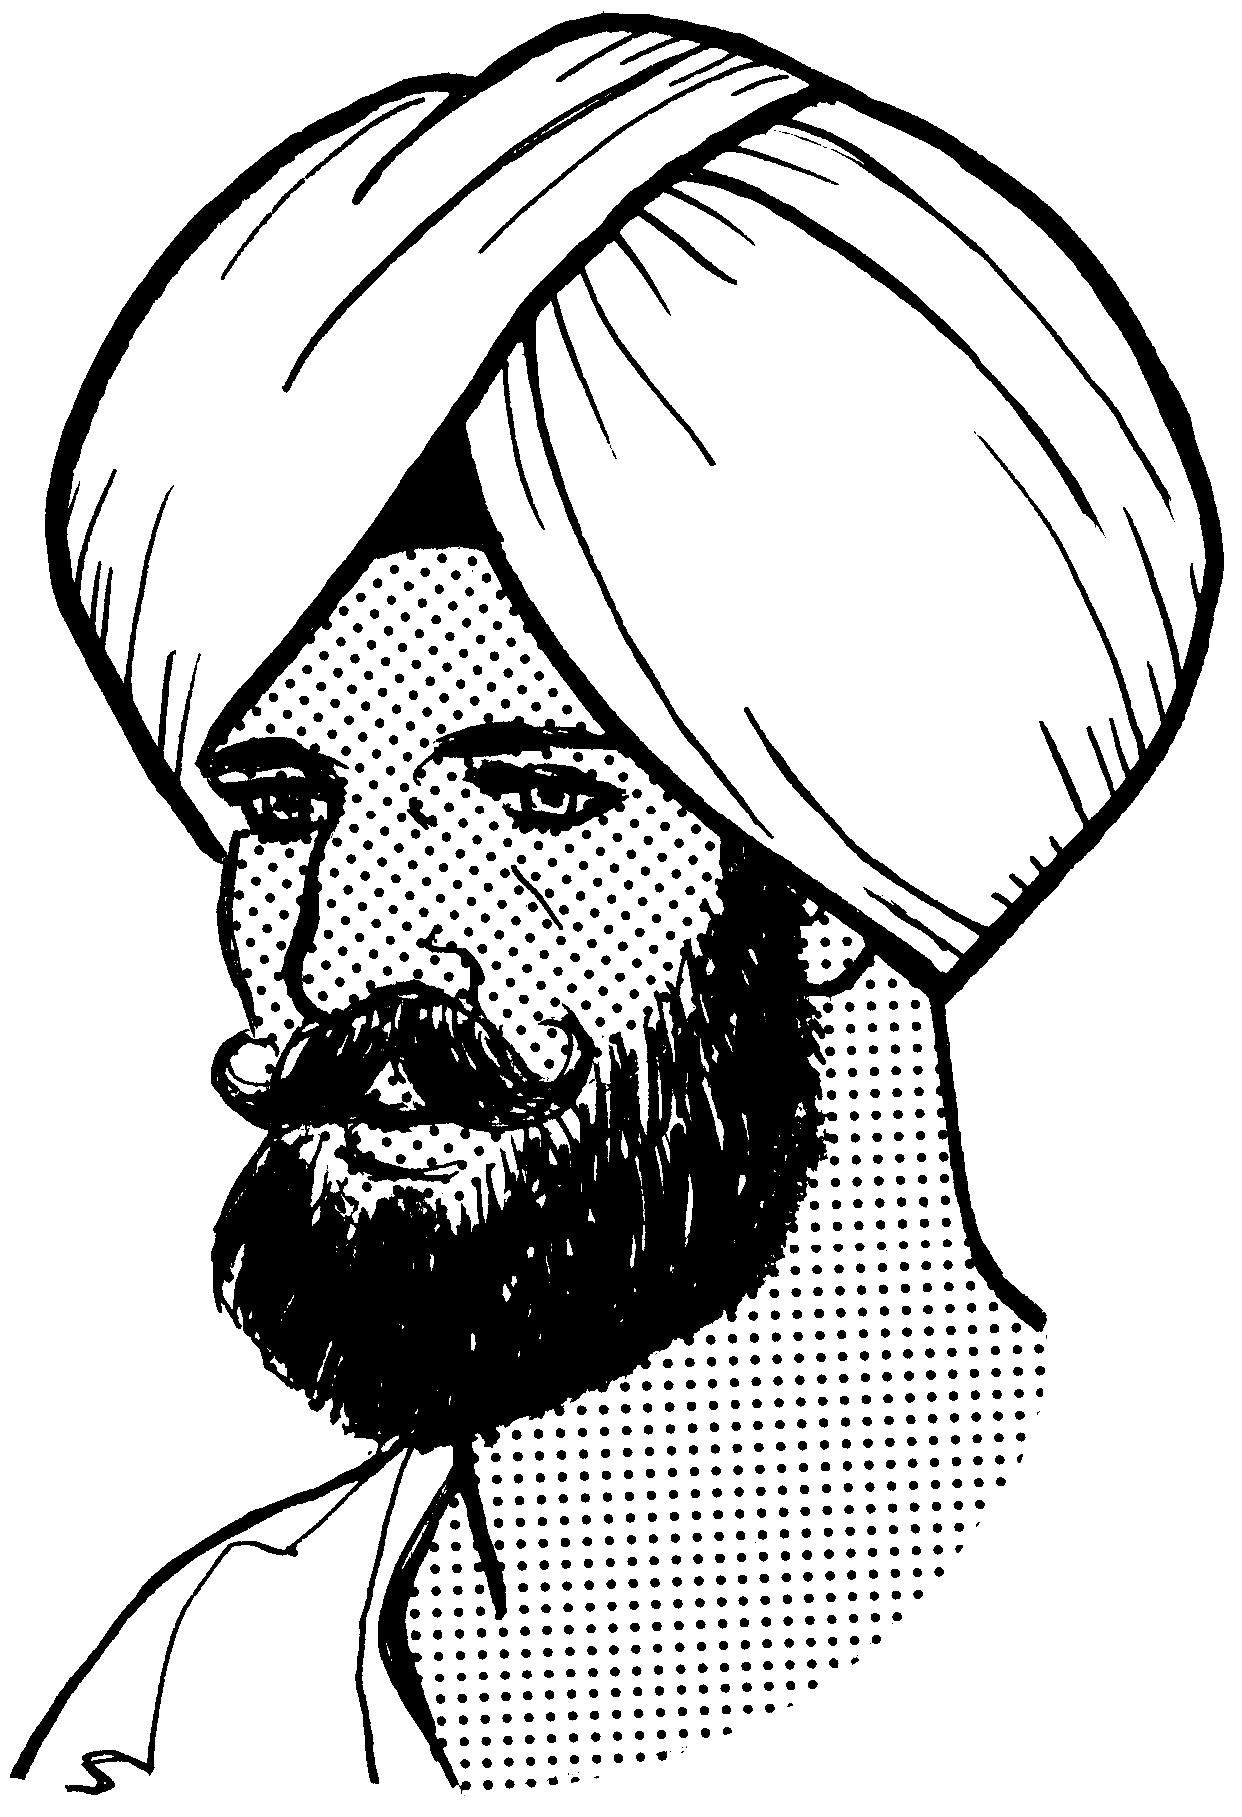 Sikh Turban PNG - 19552